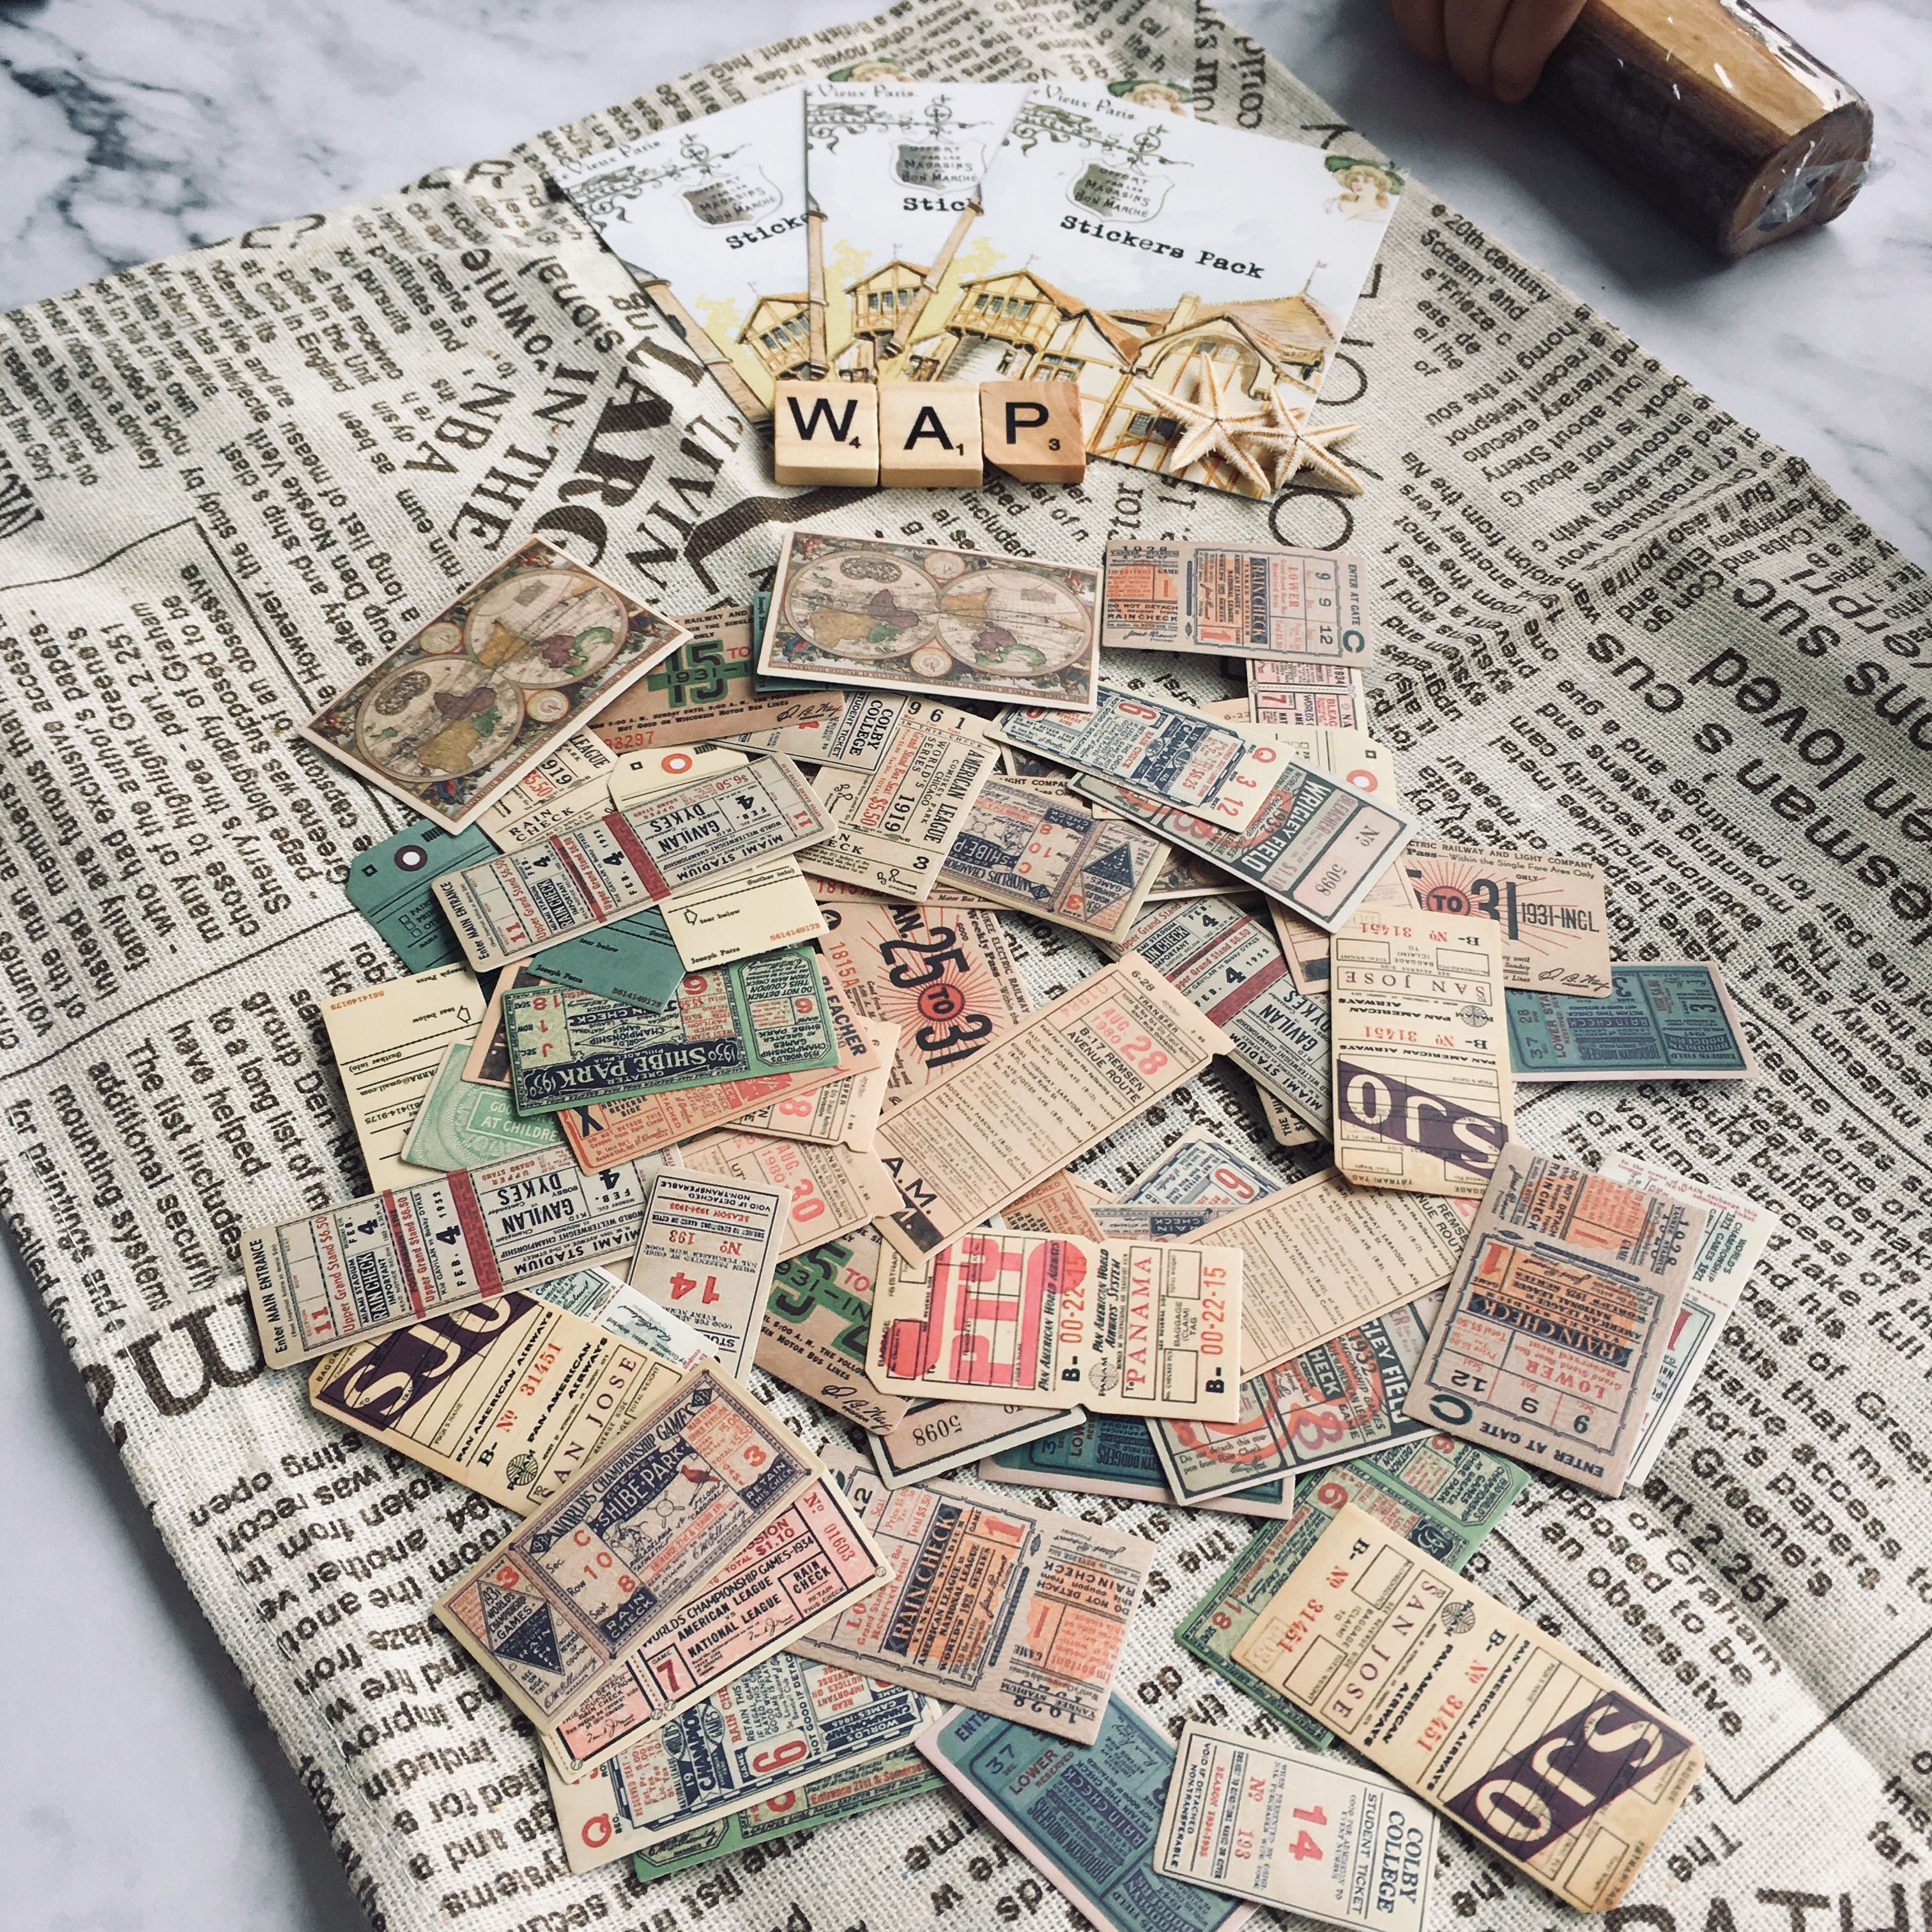 44pc/lot Tim Holtz Style Vintage Retro Tickets Old Paper Bill Europe Map Decorative Sticker DIY Scrapbooking Planner Diary Album